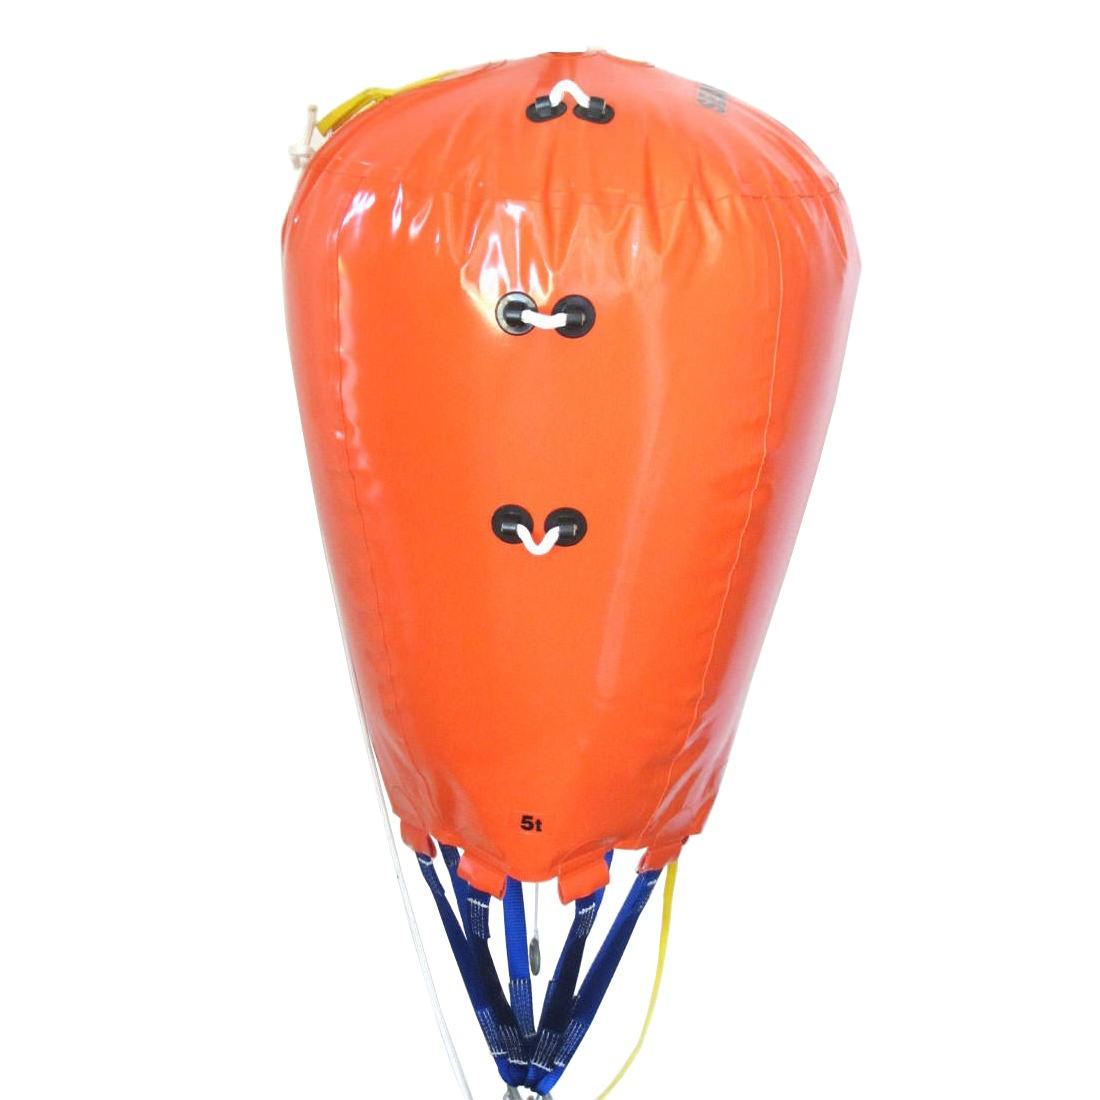 Seaflex Air Lift Bag 15 Ton Lift Capacity 15TALB-016